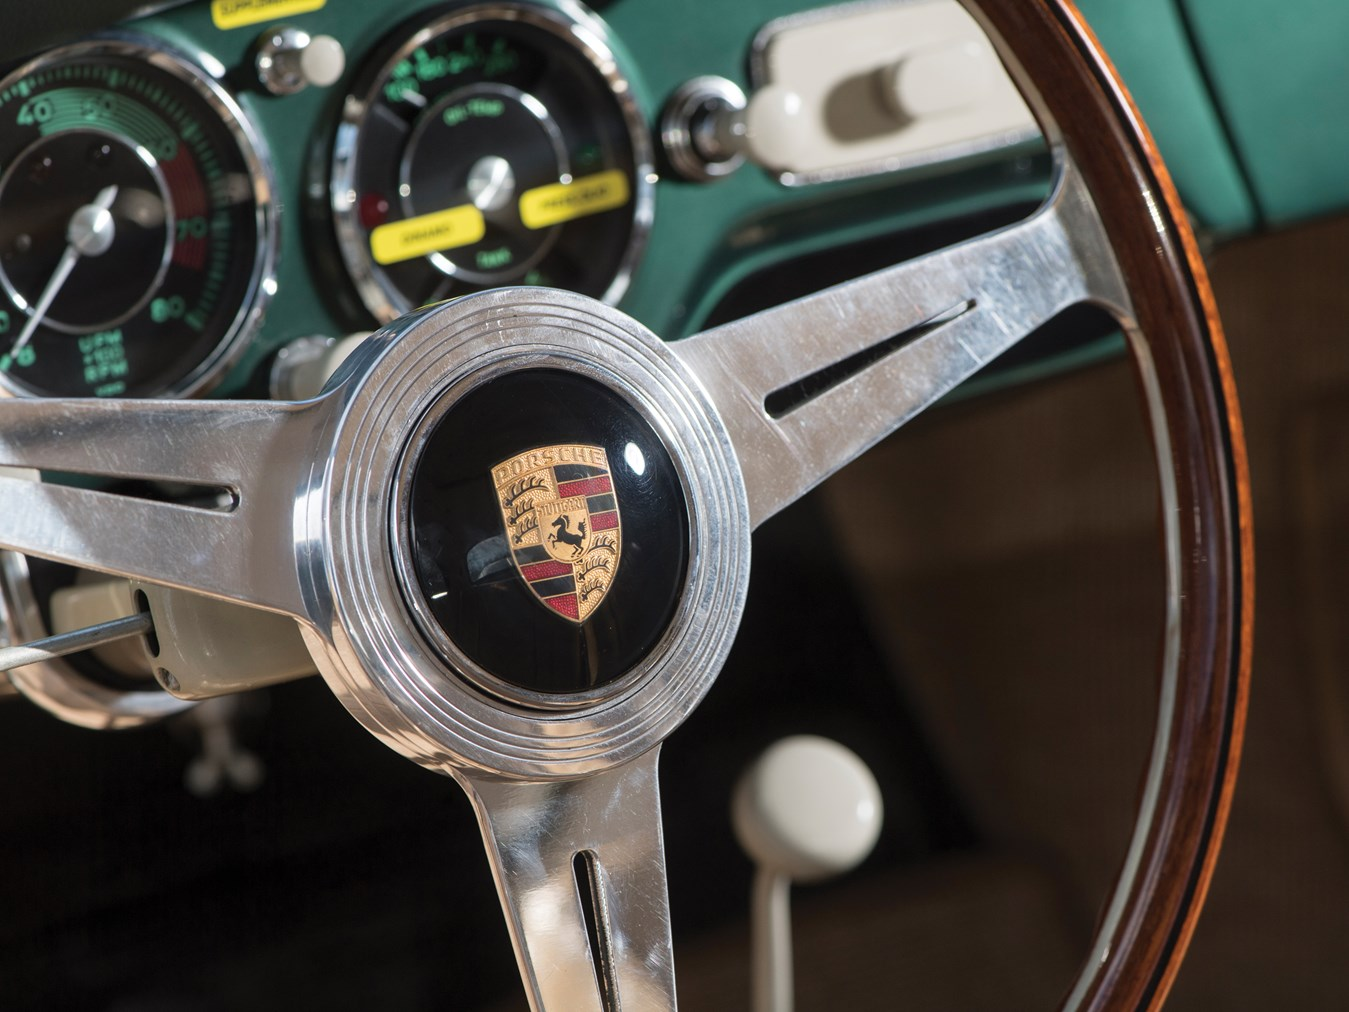 1955 Porsche 356 A Carrera GS 'Sunroof' Coupé by Reutter